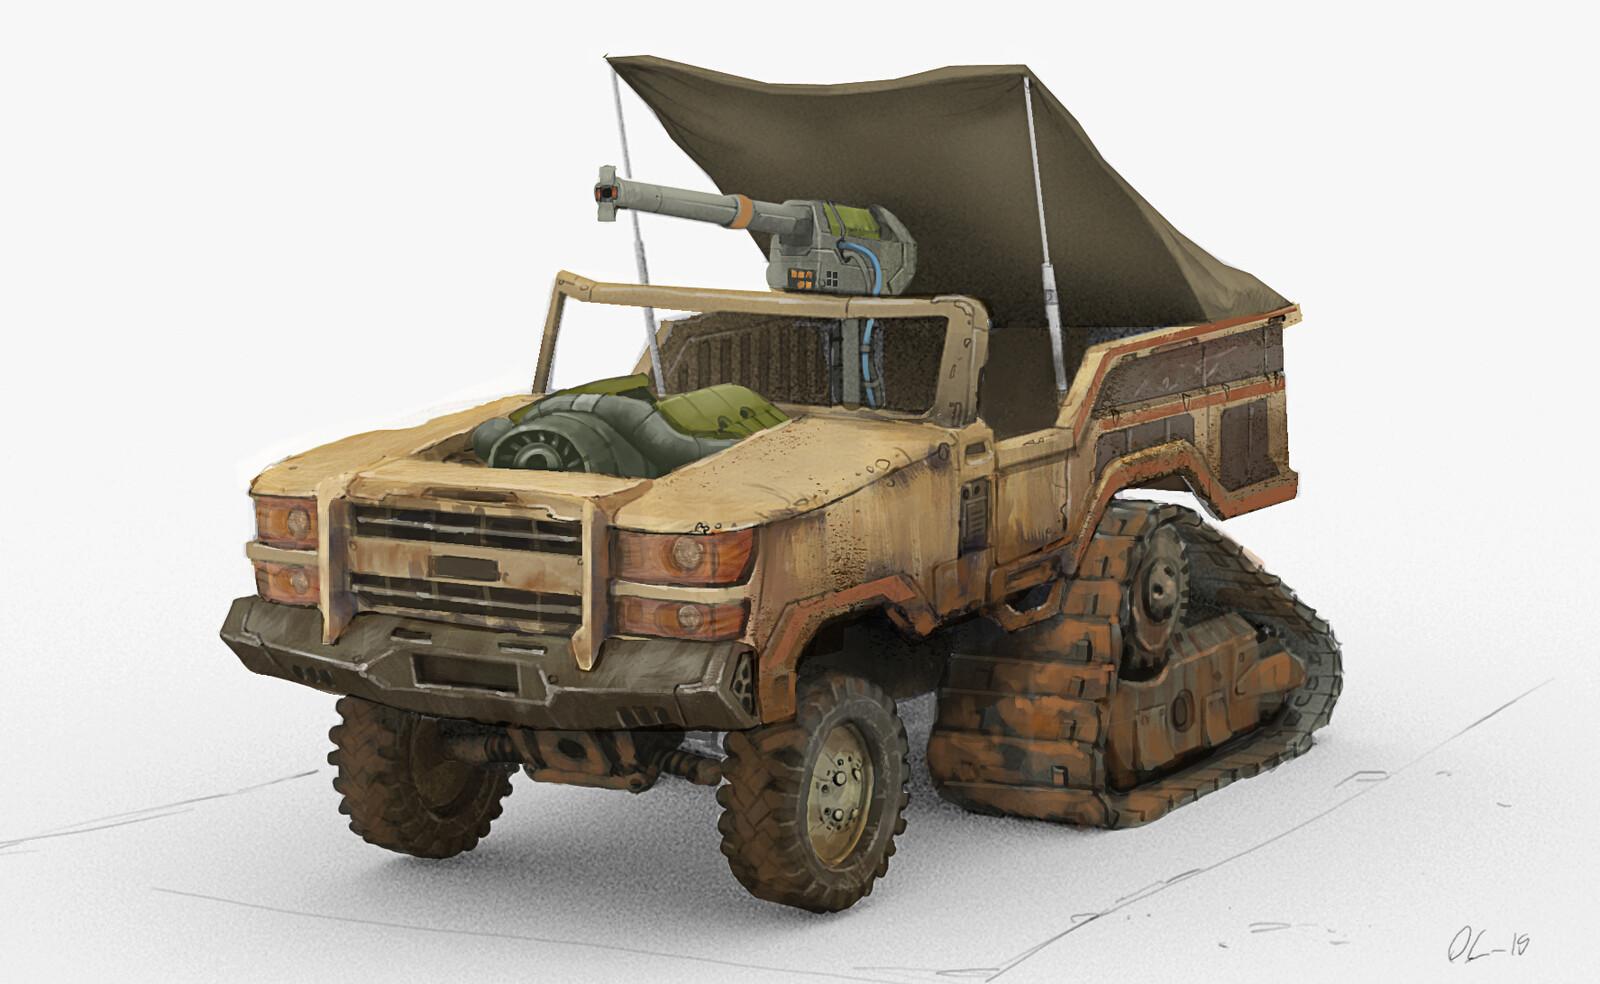 Desert pick-up truck with EMP gun attached